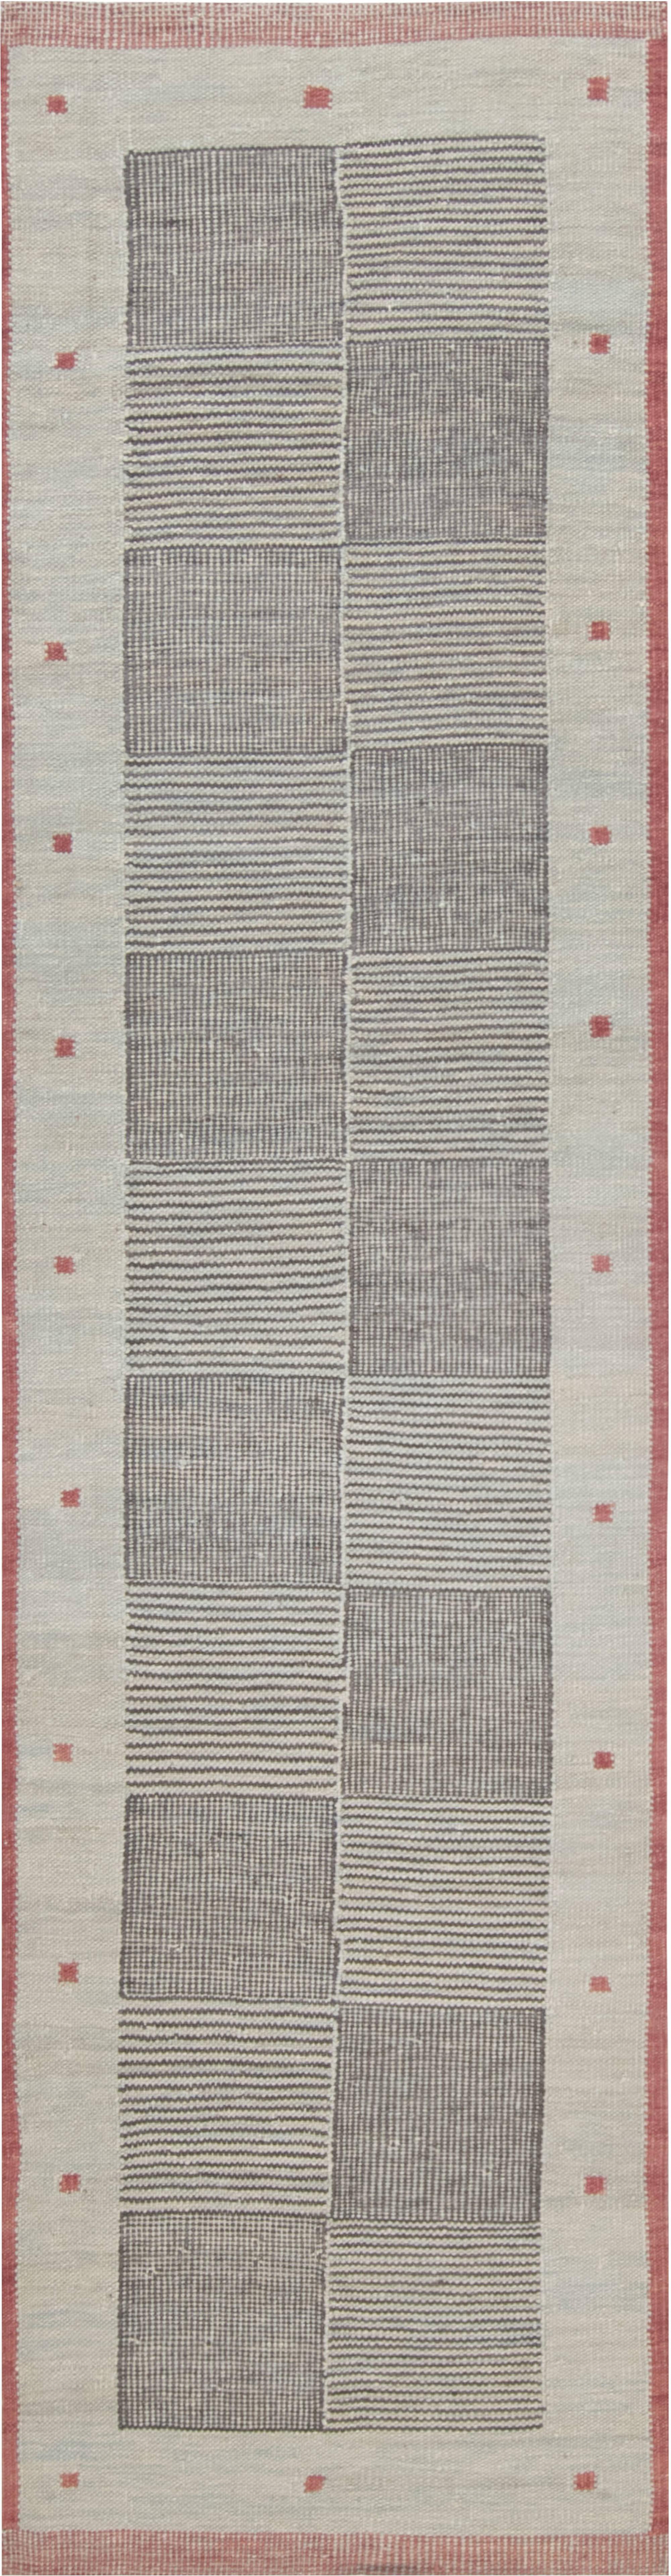 Swedish Flat Weave Runner N12056